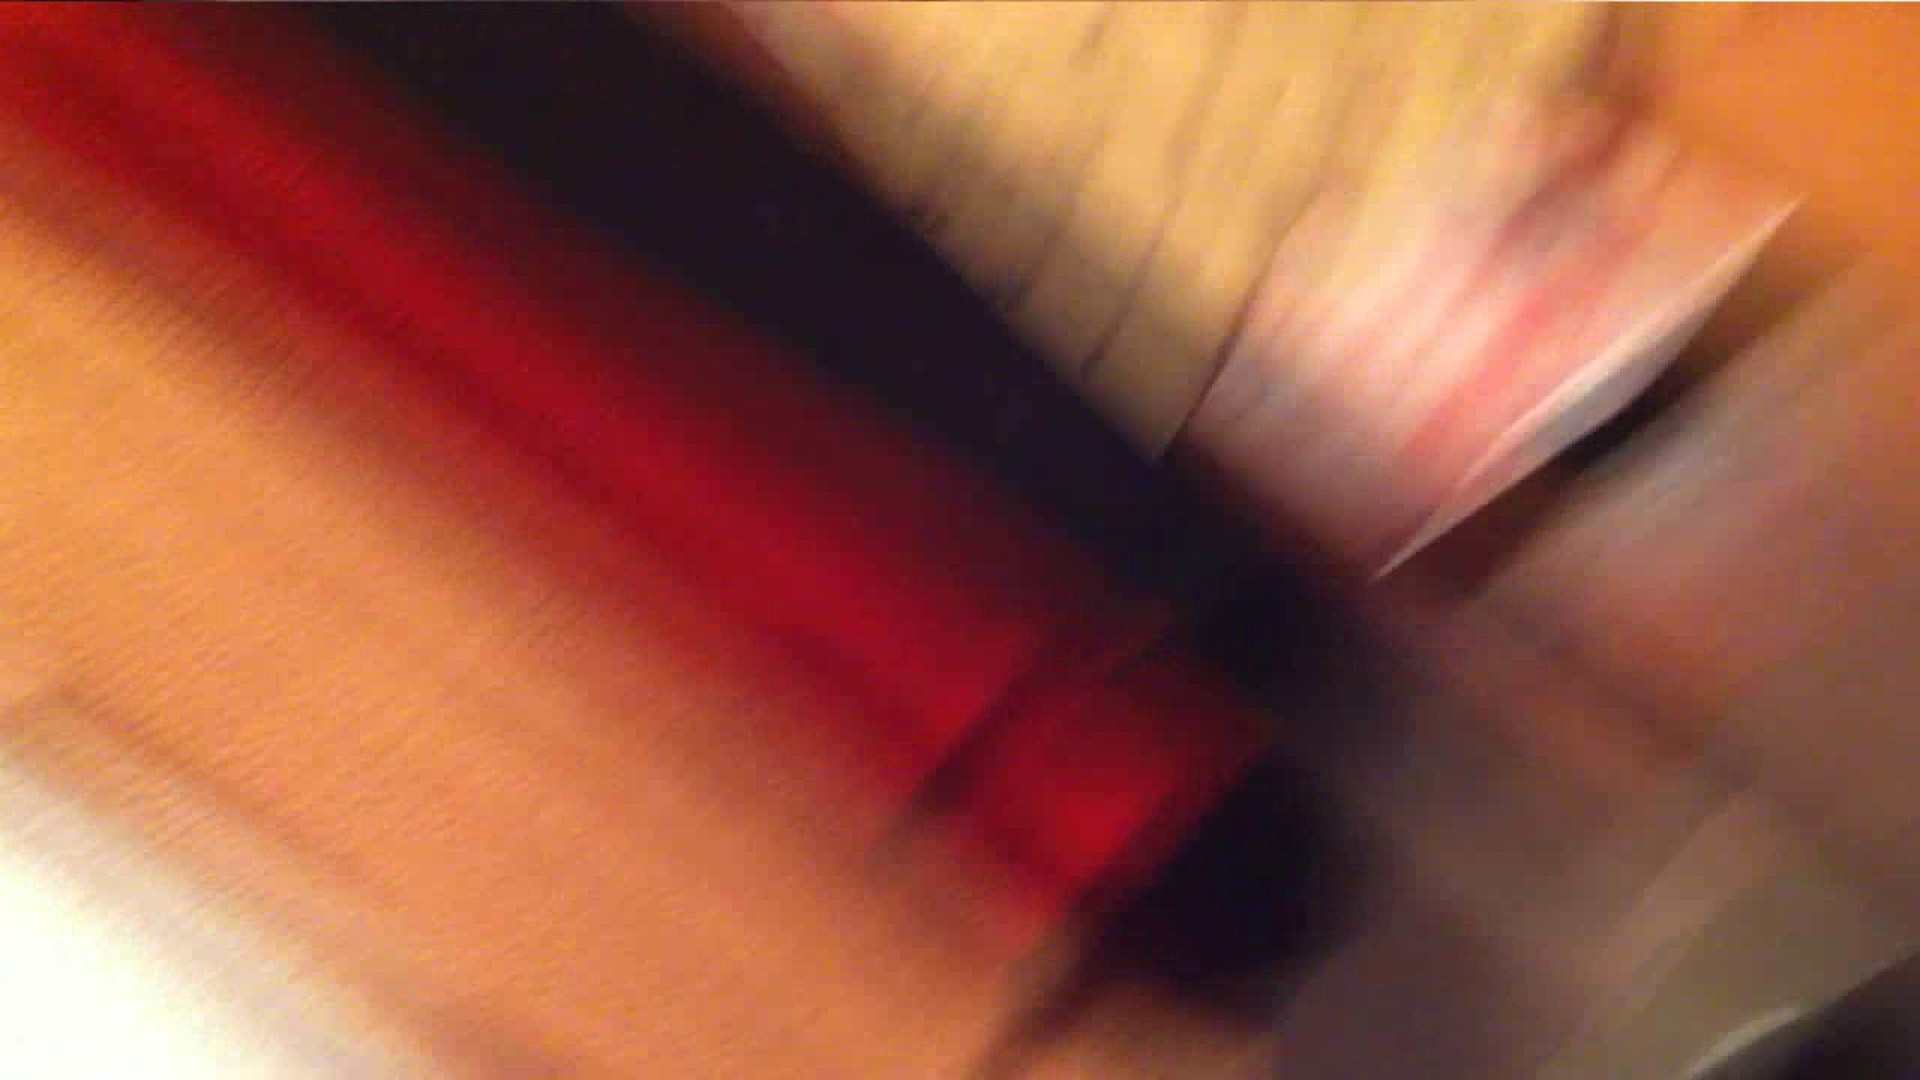 vol.35 美人アパレル胸チラ&パンチラ ひらひらスカートの中身は? 胸チラ SEX無修正画像 104画像 5